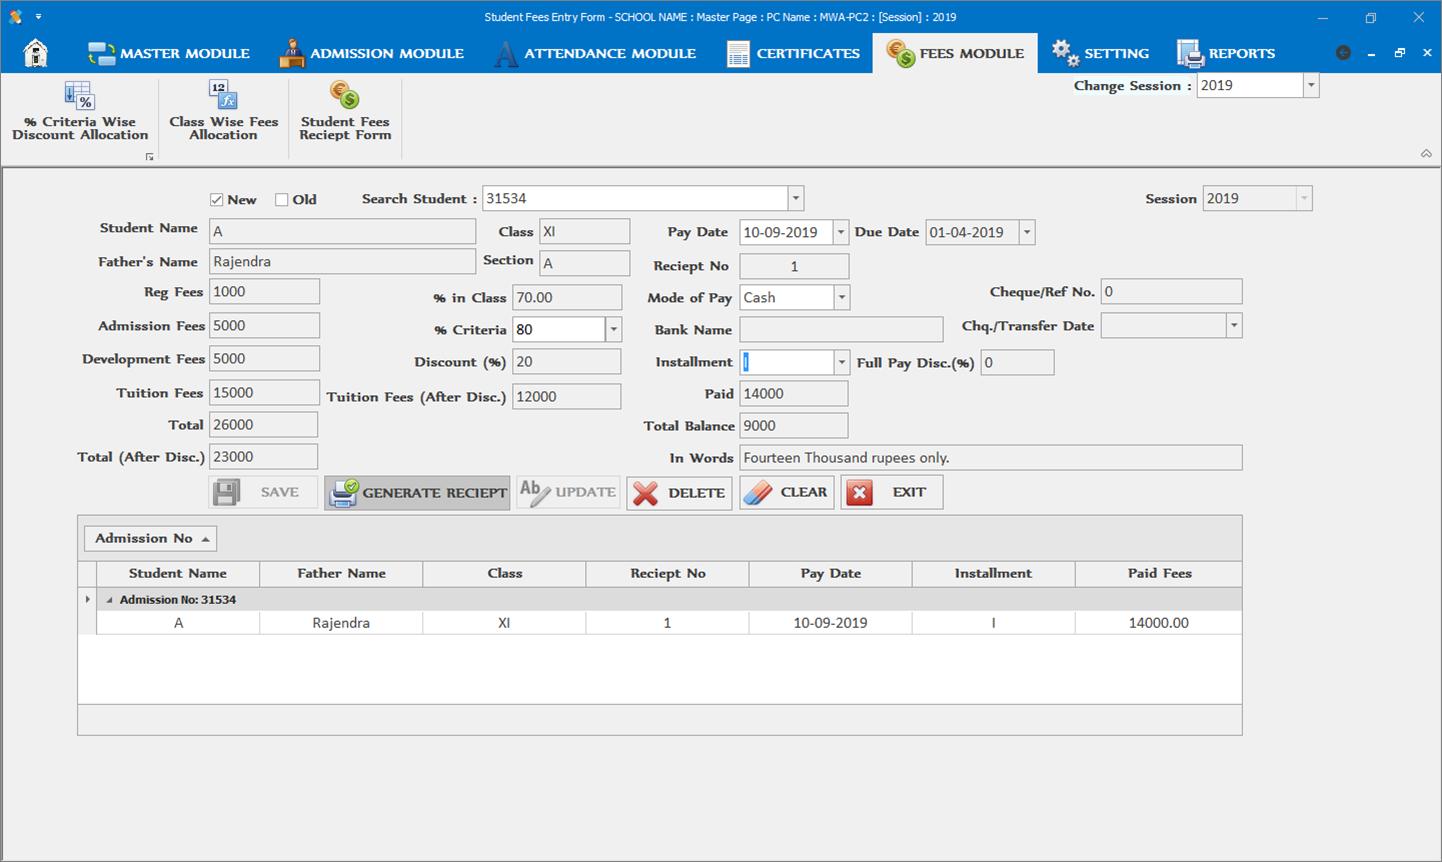 school erp software - MyWebApp Software and Analytics